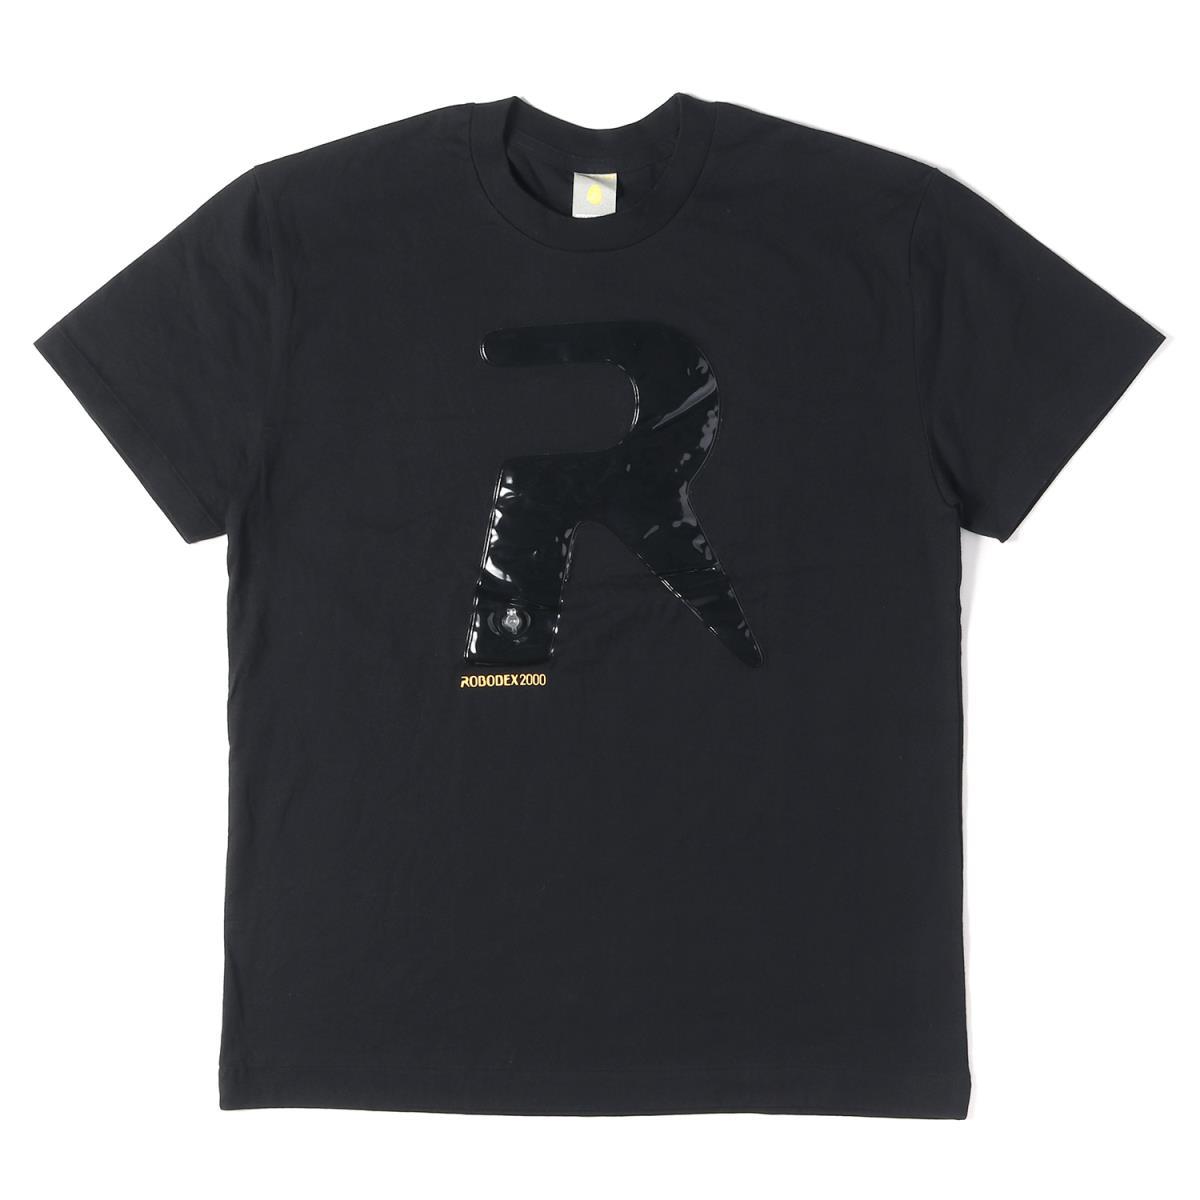 ISSEY MIYAKE (イッセイミヤケ) ROBODEX2000開催記念 RパッチロゴクルーネックTシャツ ブラック L 【メンズ】【中古】【新品同様】【K2319】【あす楽☆対応可】